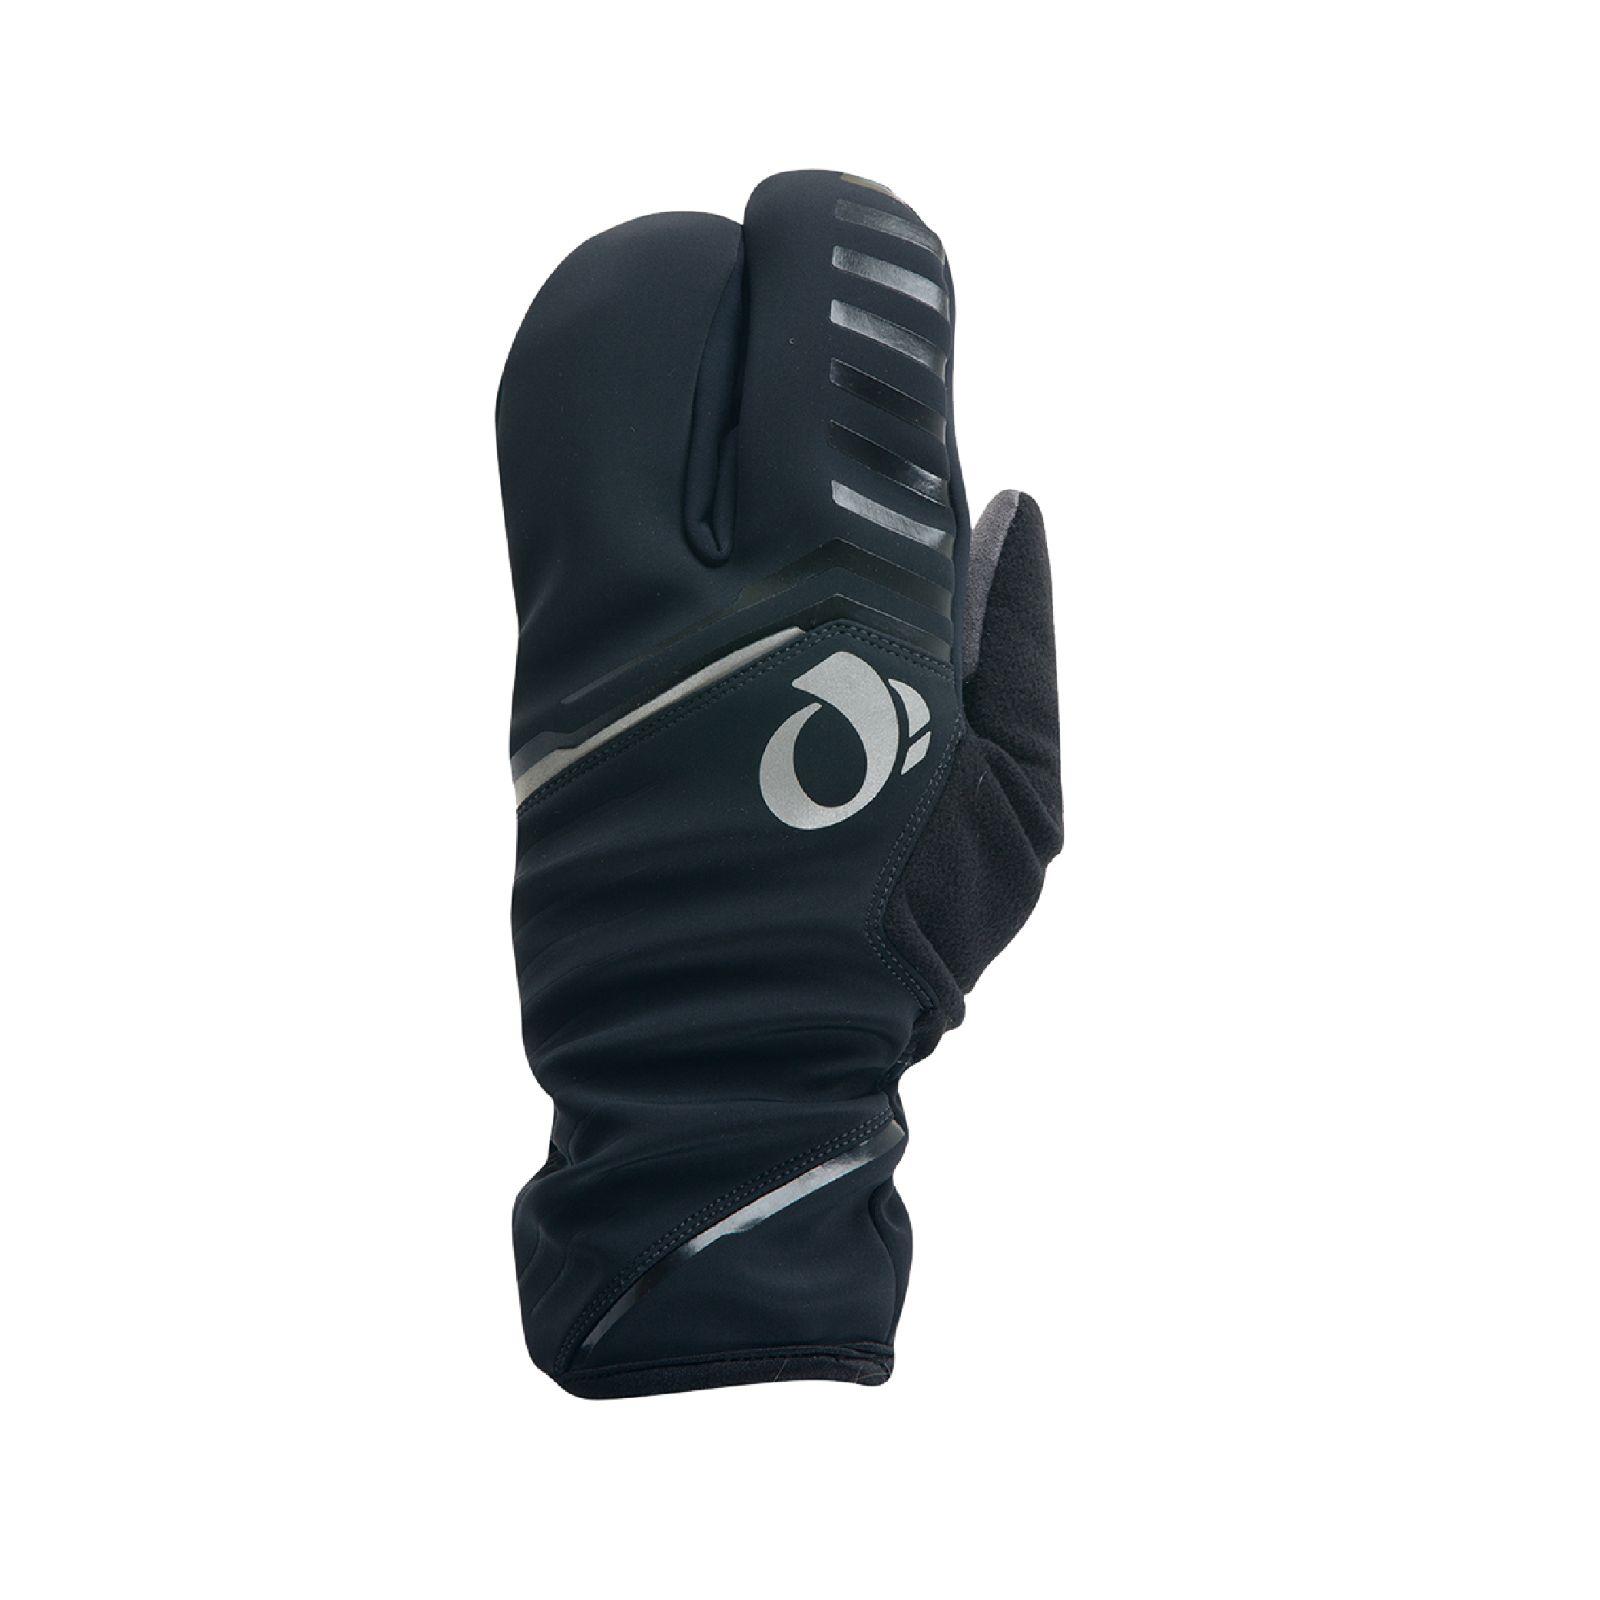 Gloves pearl izumi unisex pro amfib lobster glove black